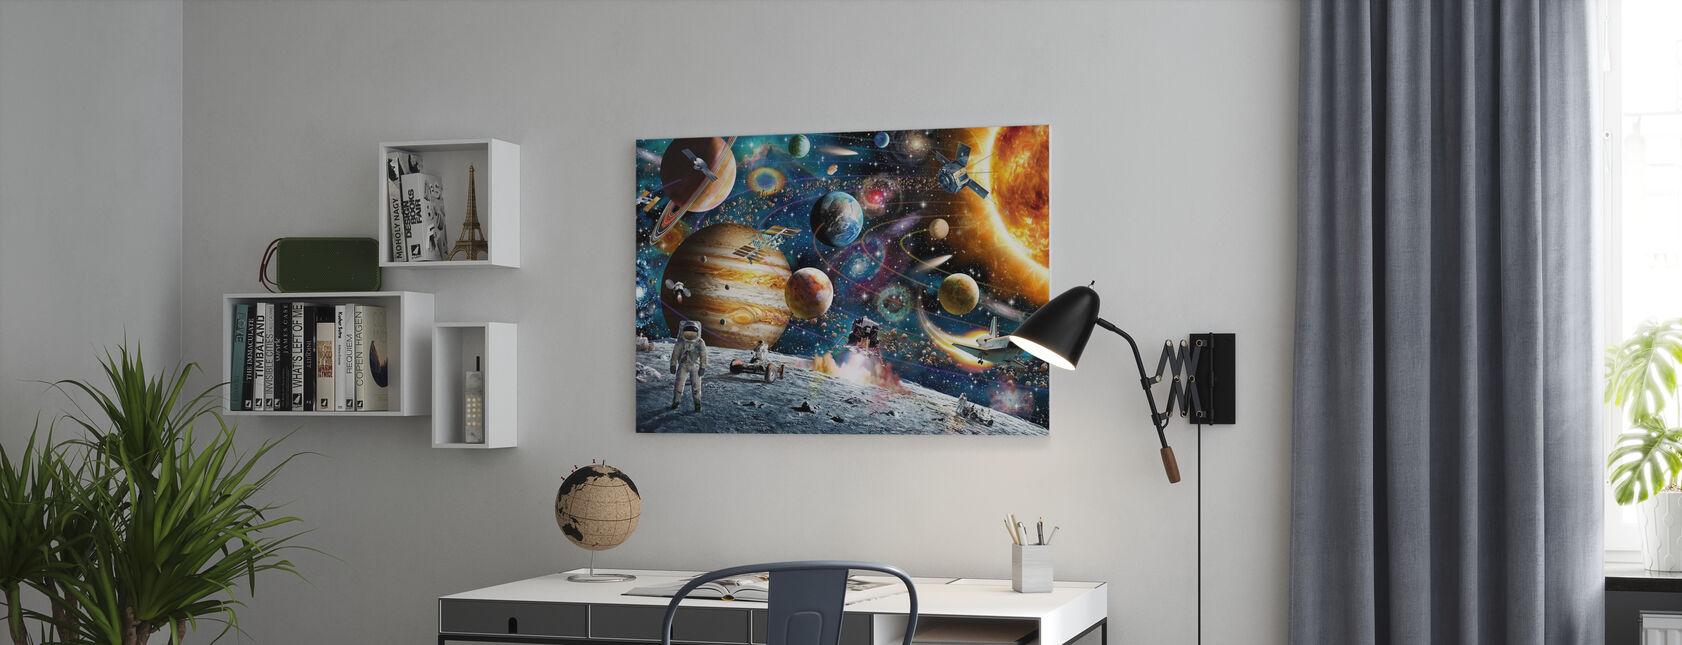 Odyssée spatiale - Impression sur toile - Bureau